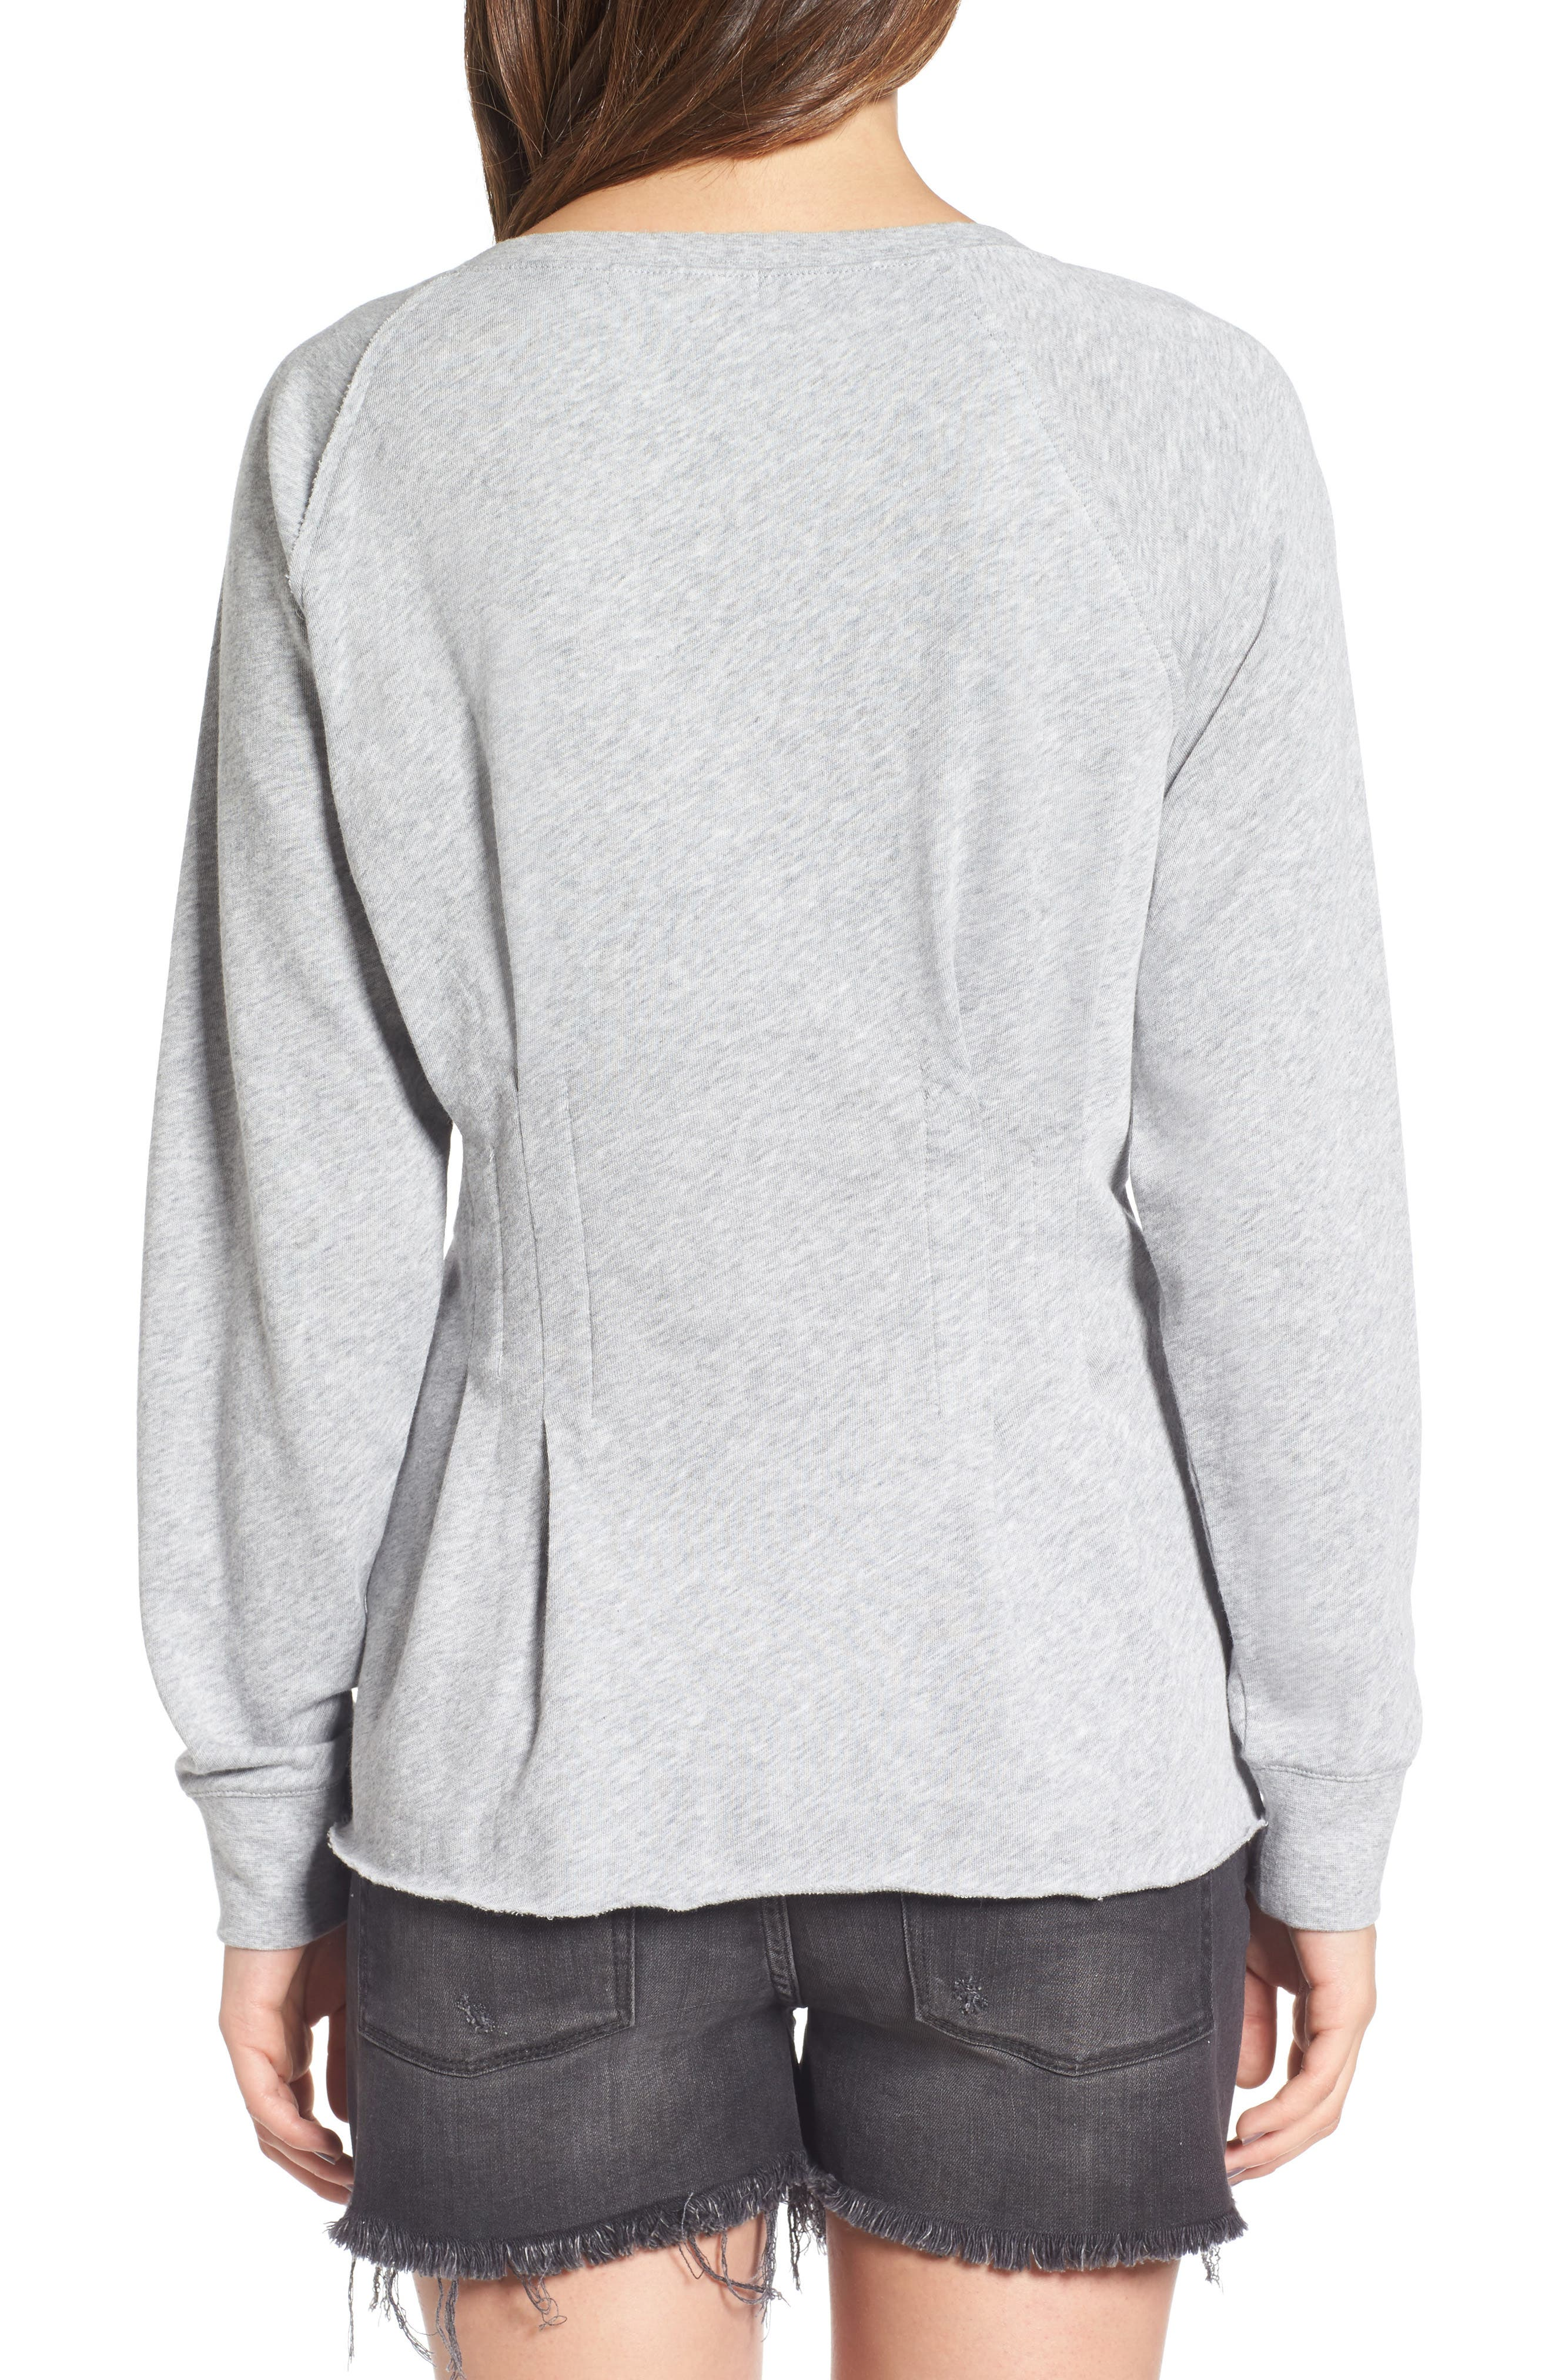 Cinch Waist Sweatshirt,                             Alternate thumbnail 2, color,                             020